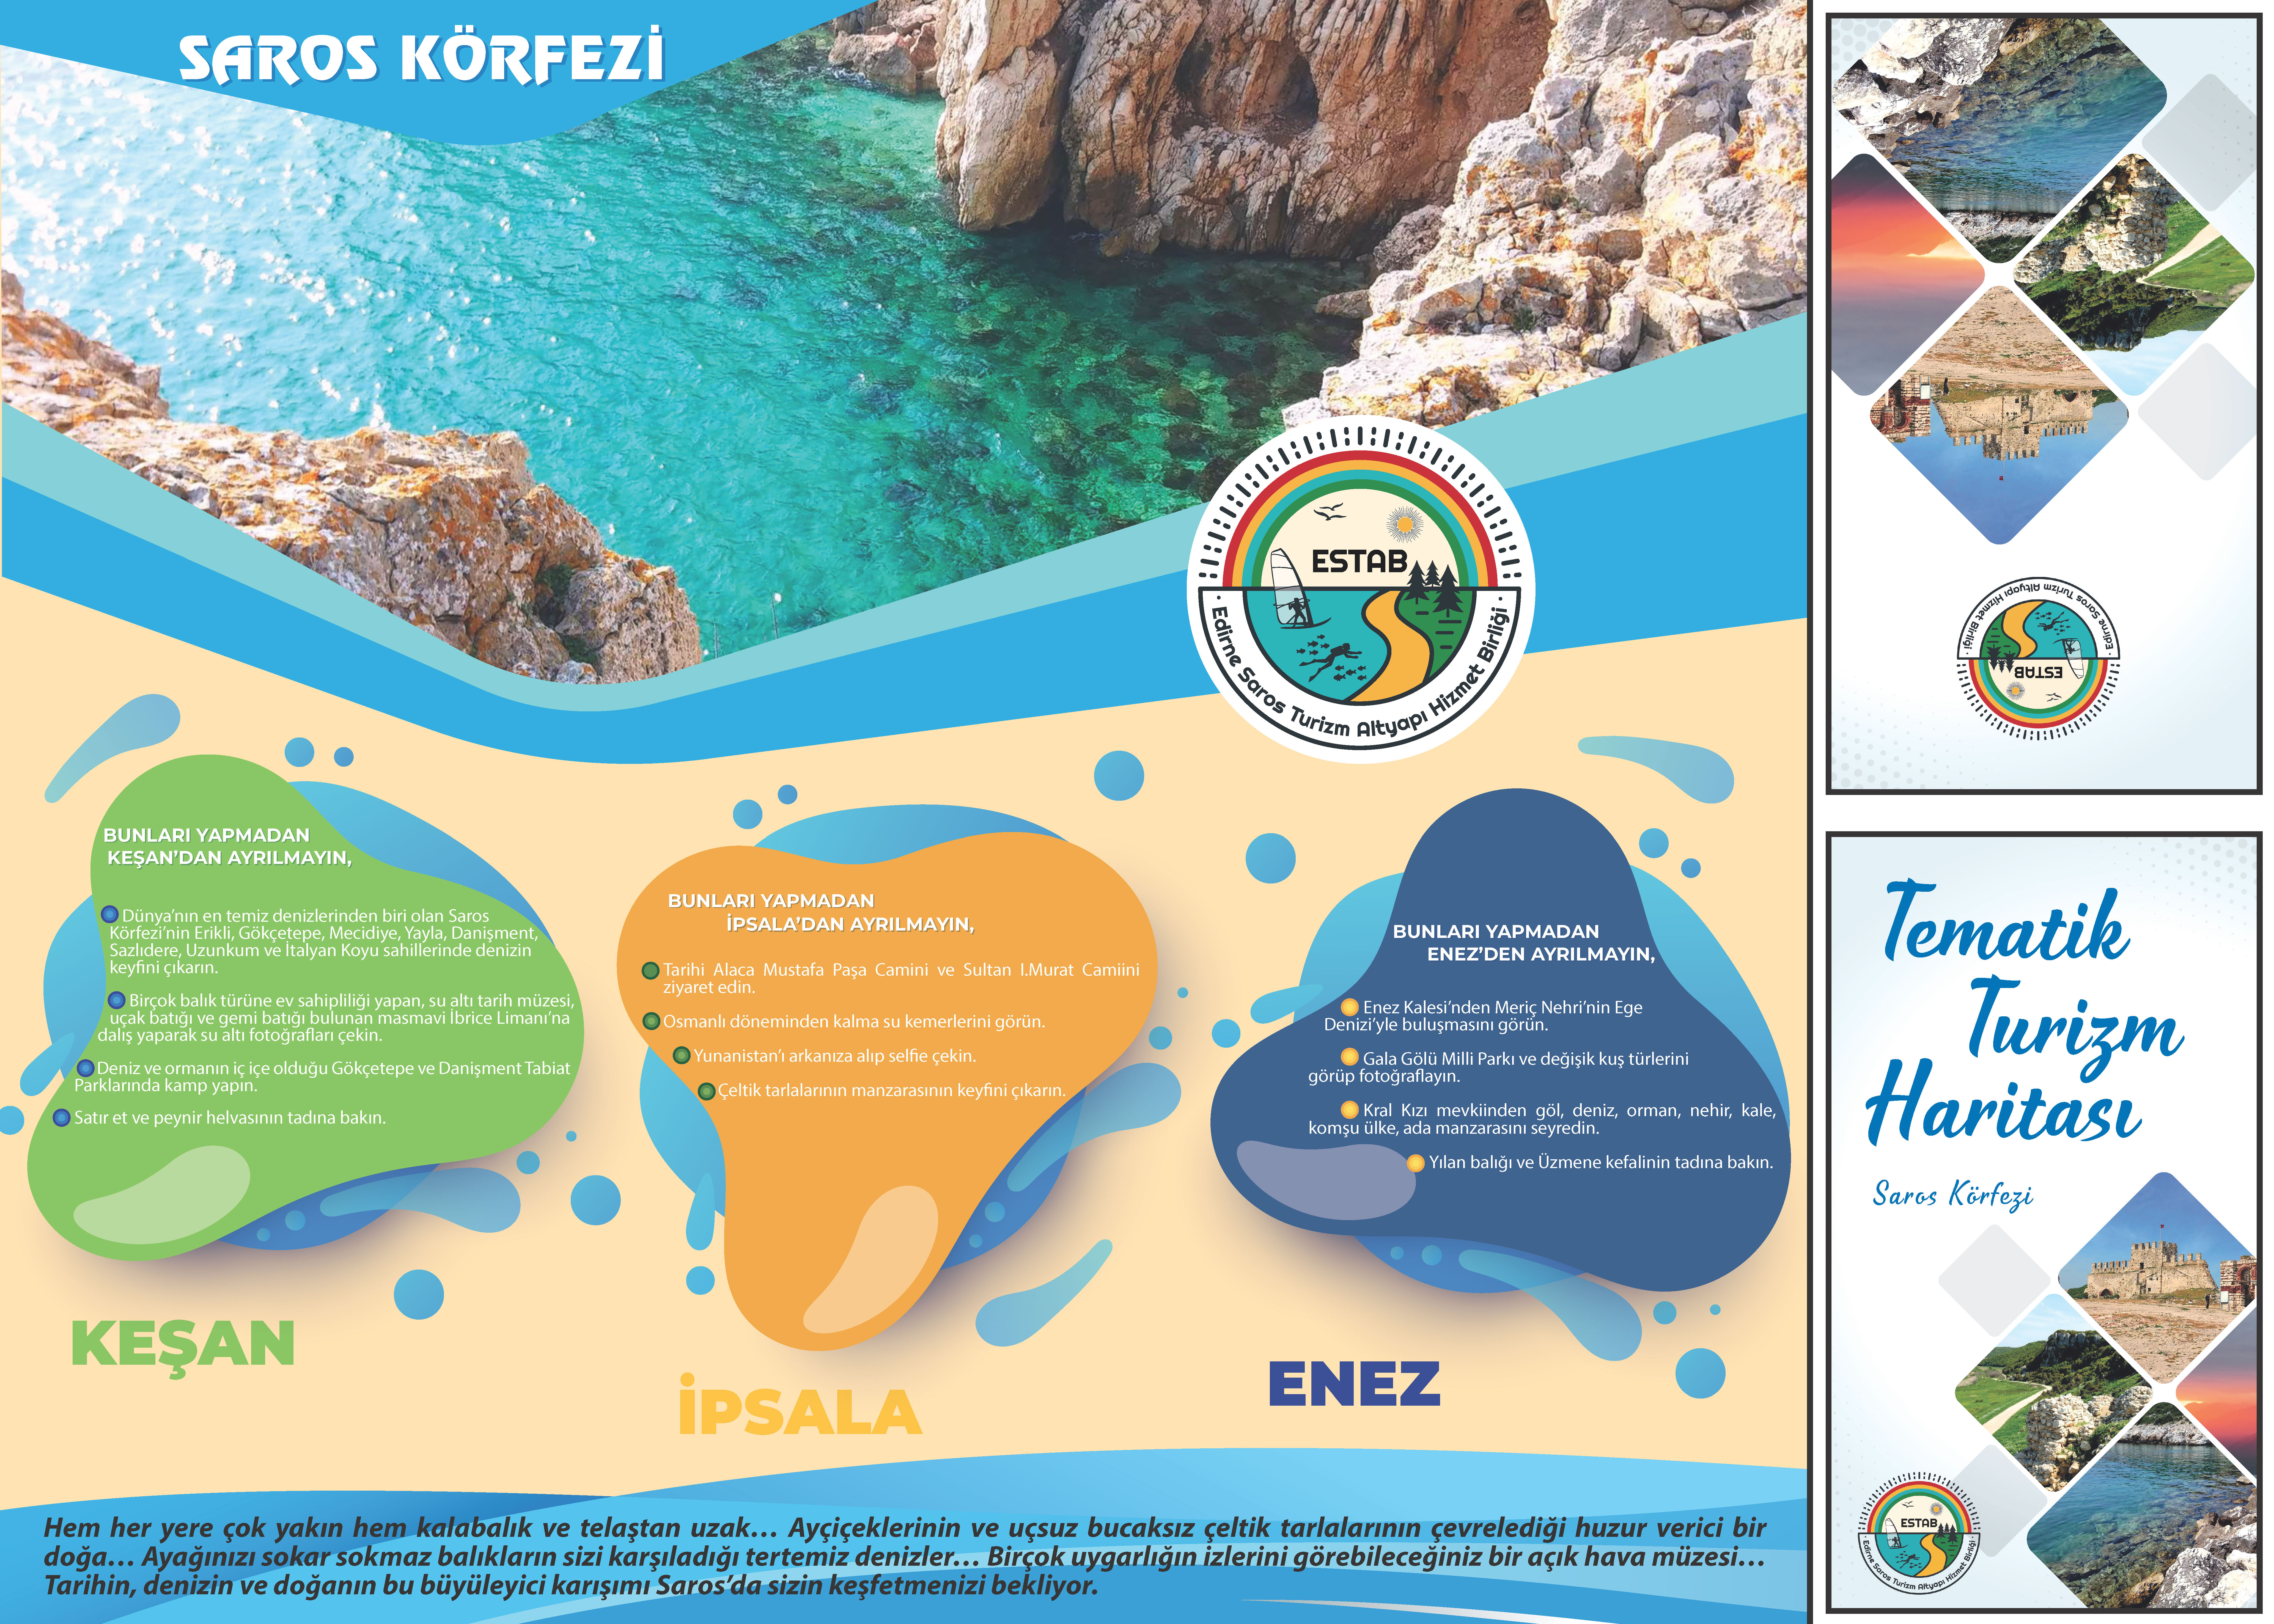 Estab Turistik Harita